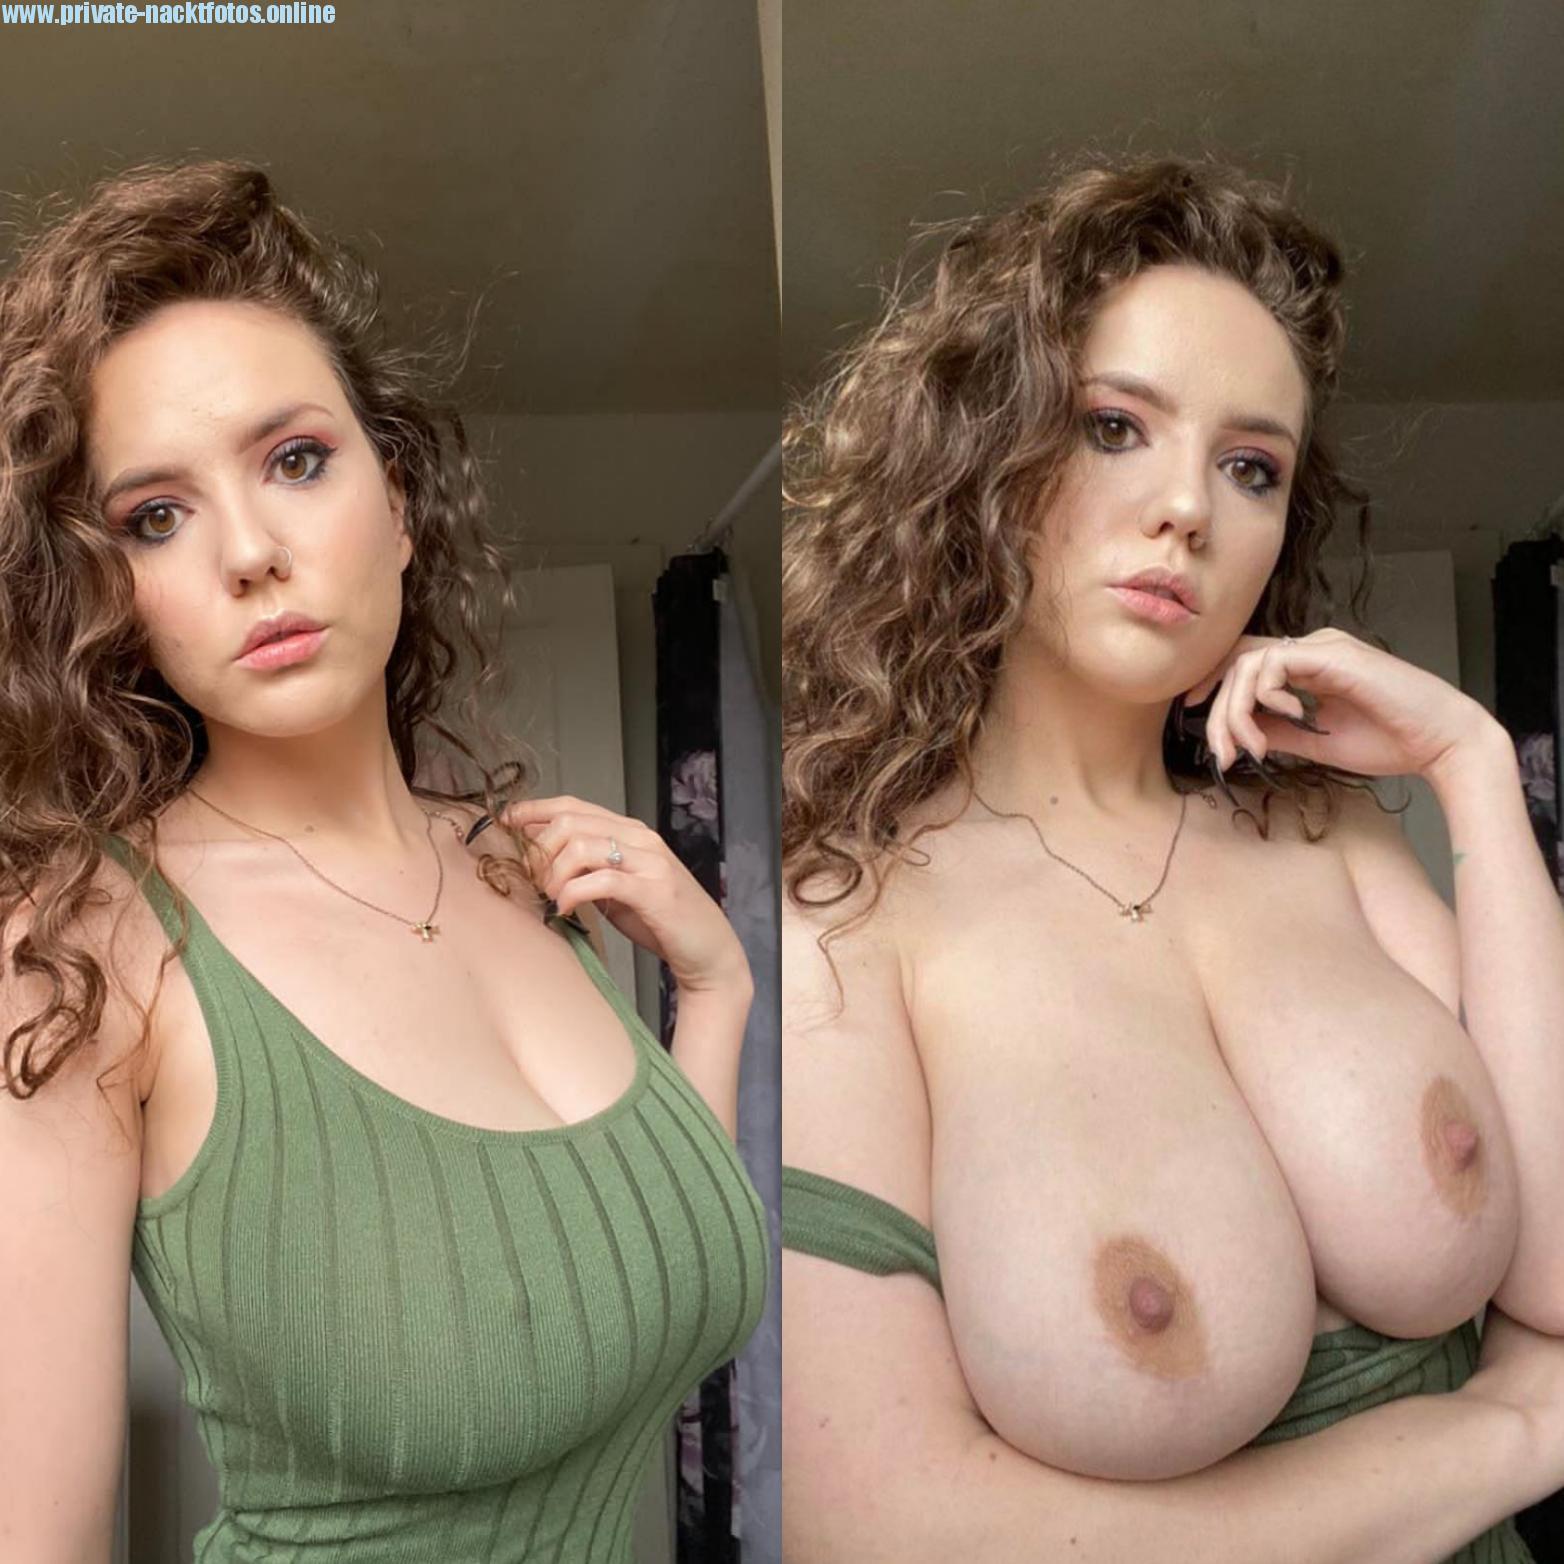 Amateur Sexy Freundin Grosse Brueste Big Tits